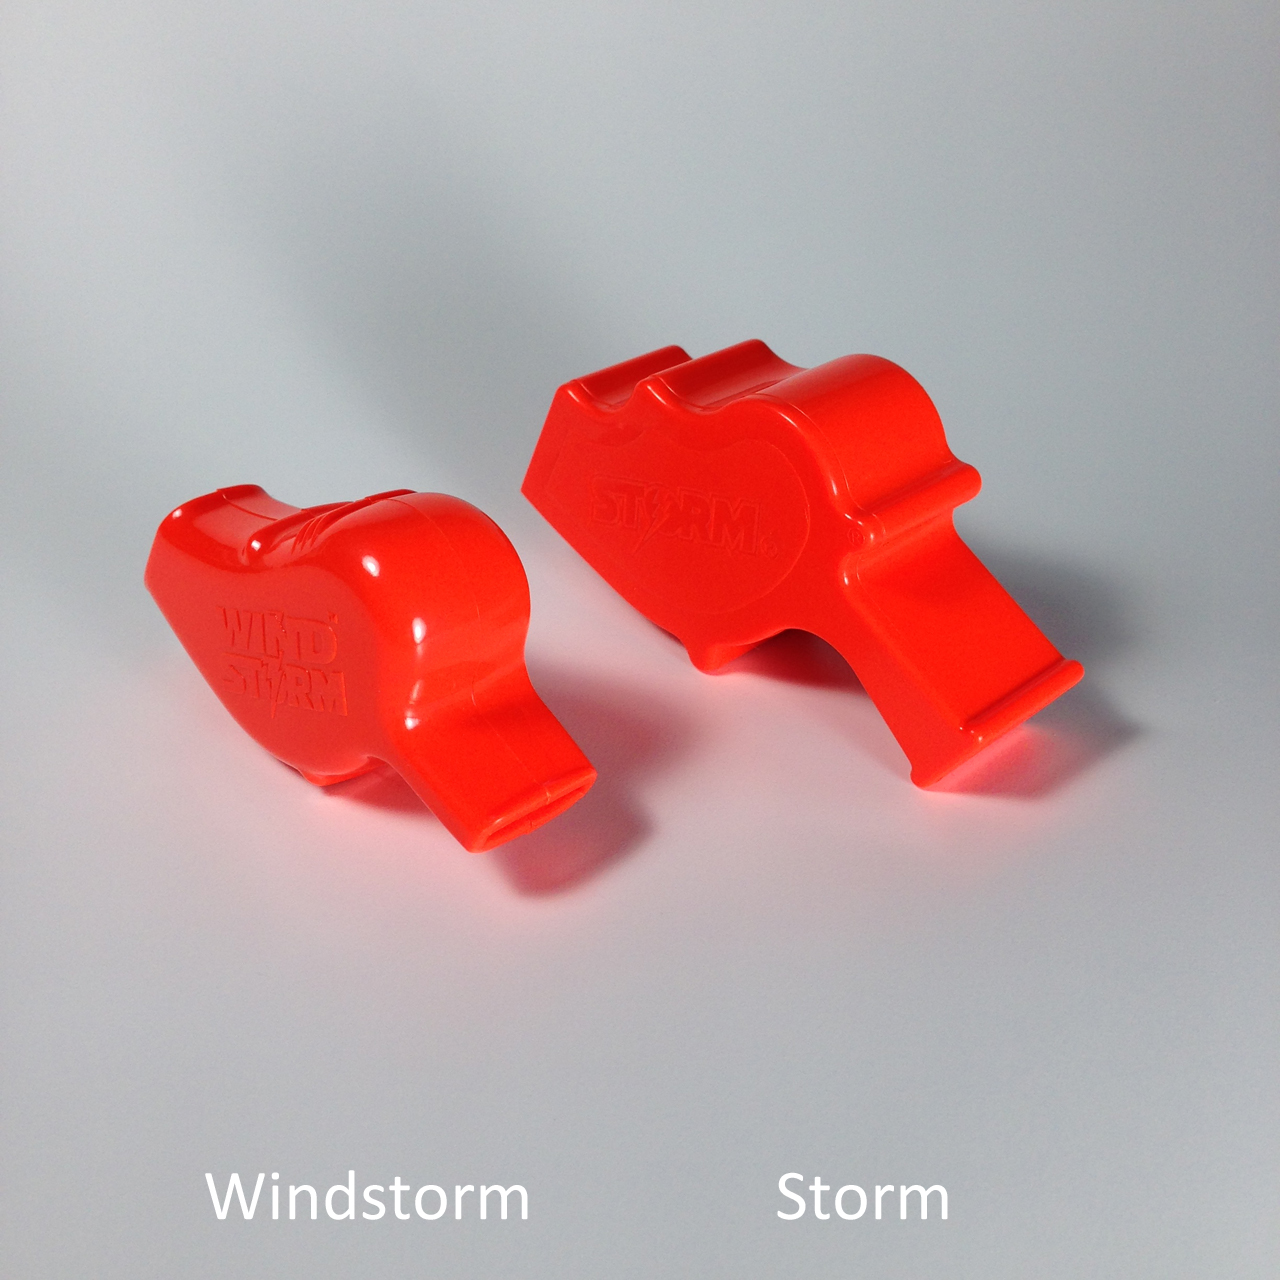 storm-windstorm-comparison2.jpg